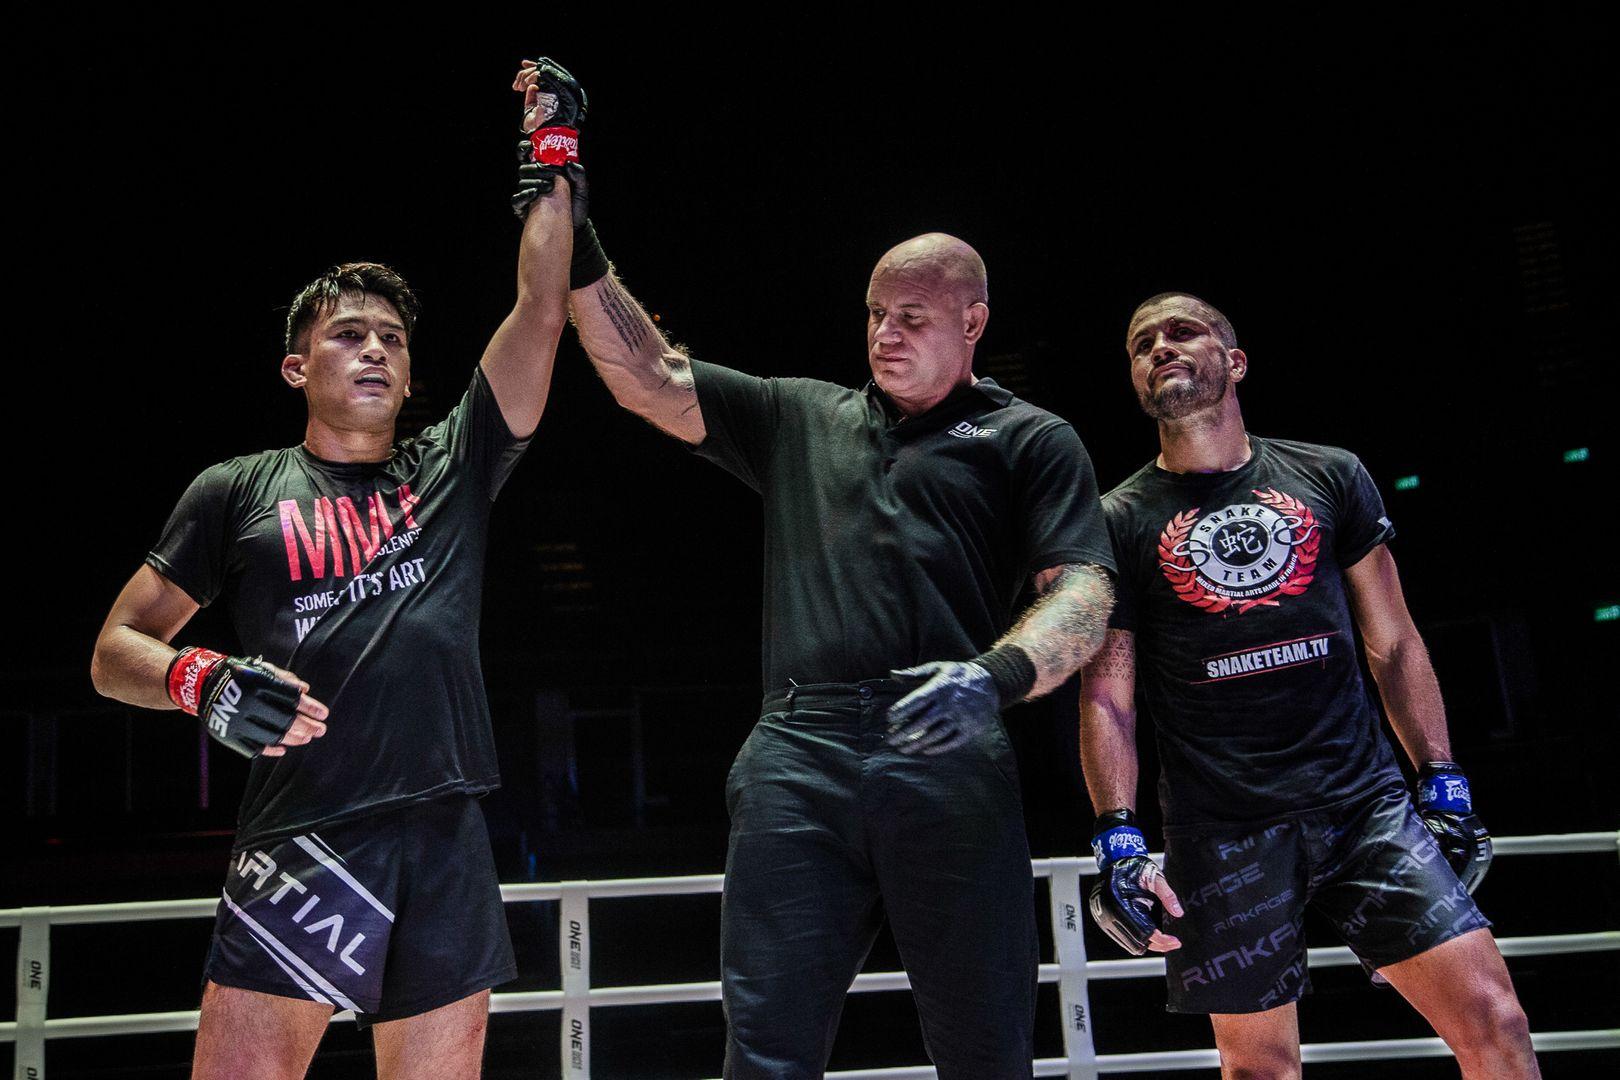 Thai mixed martial artist Shannon Wiratchai defeats Fabio Pinca